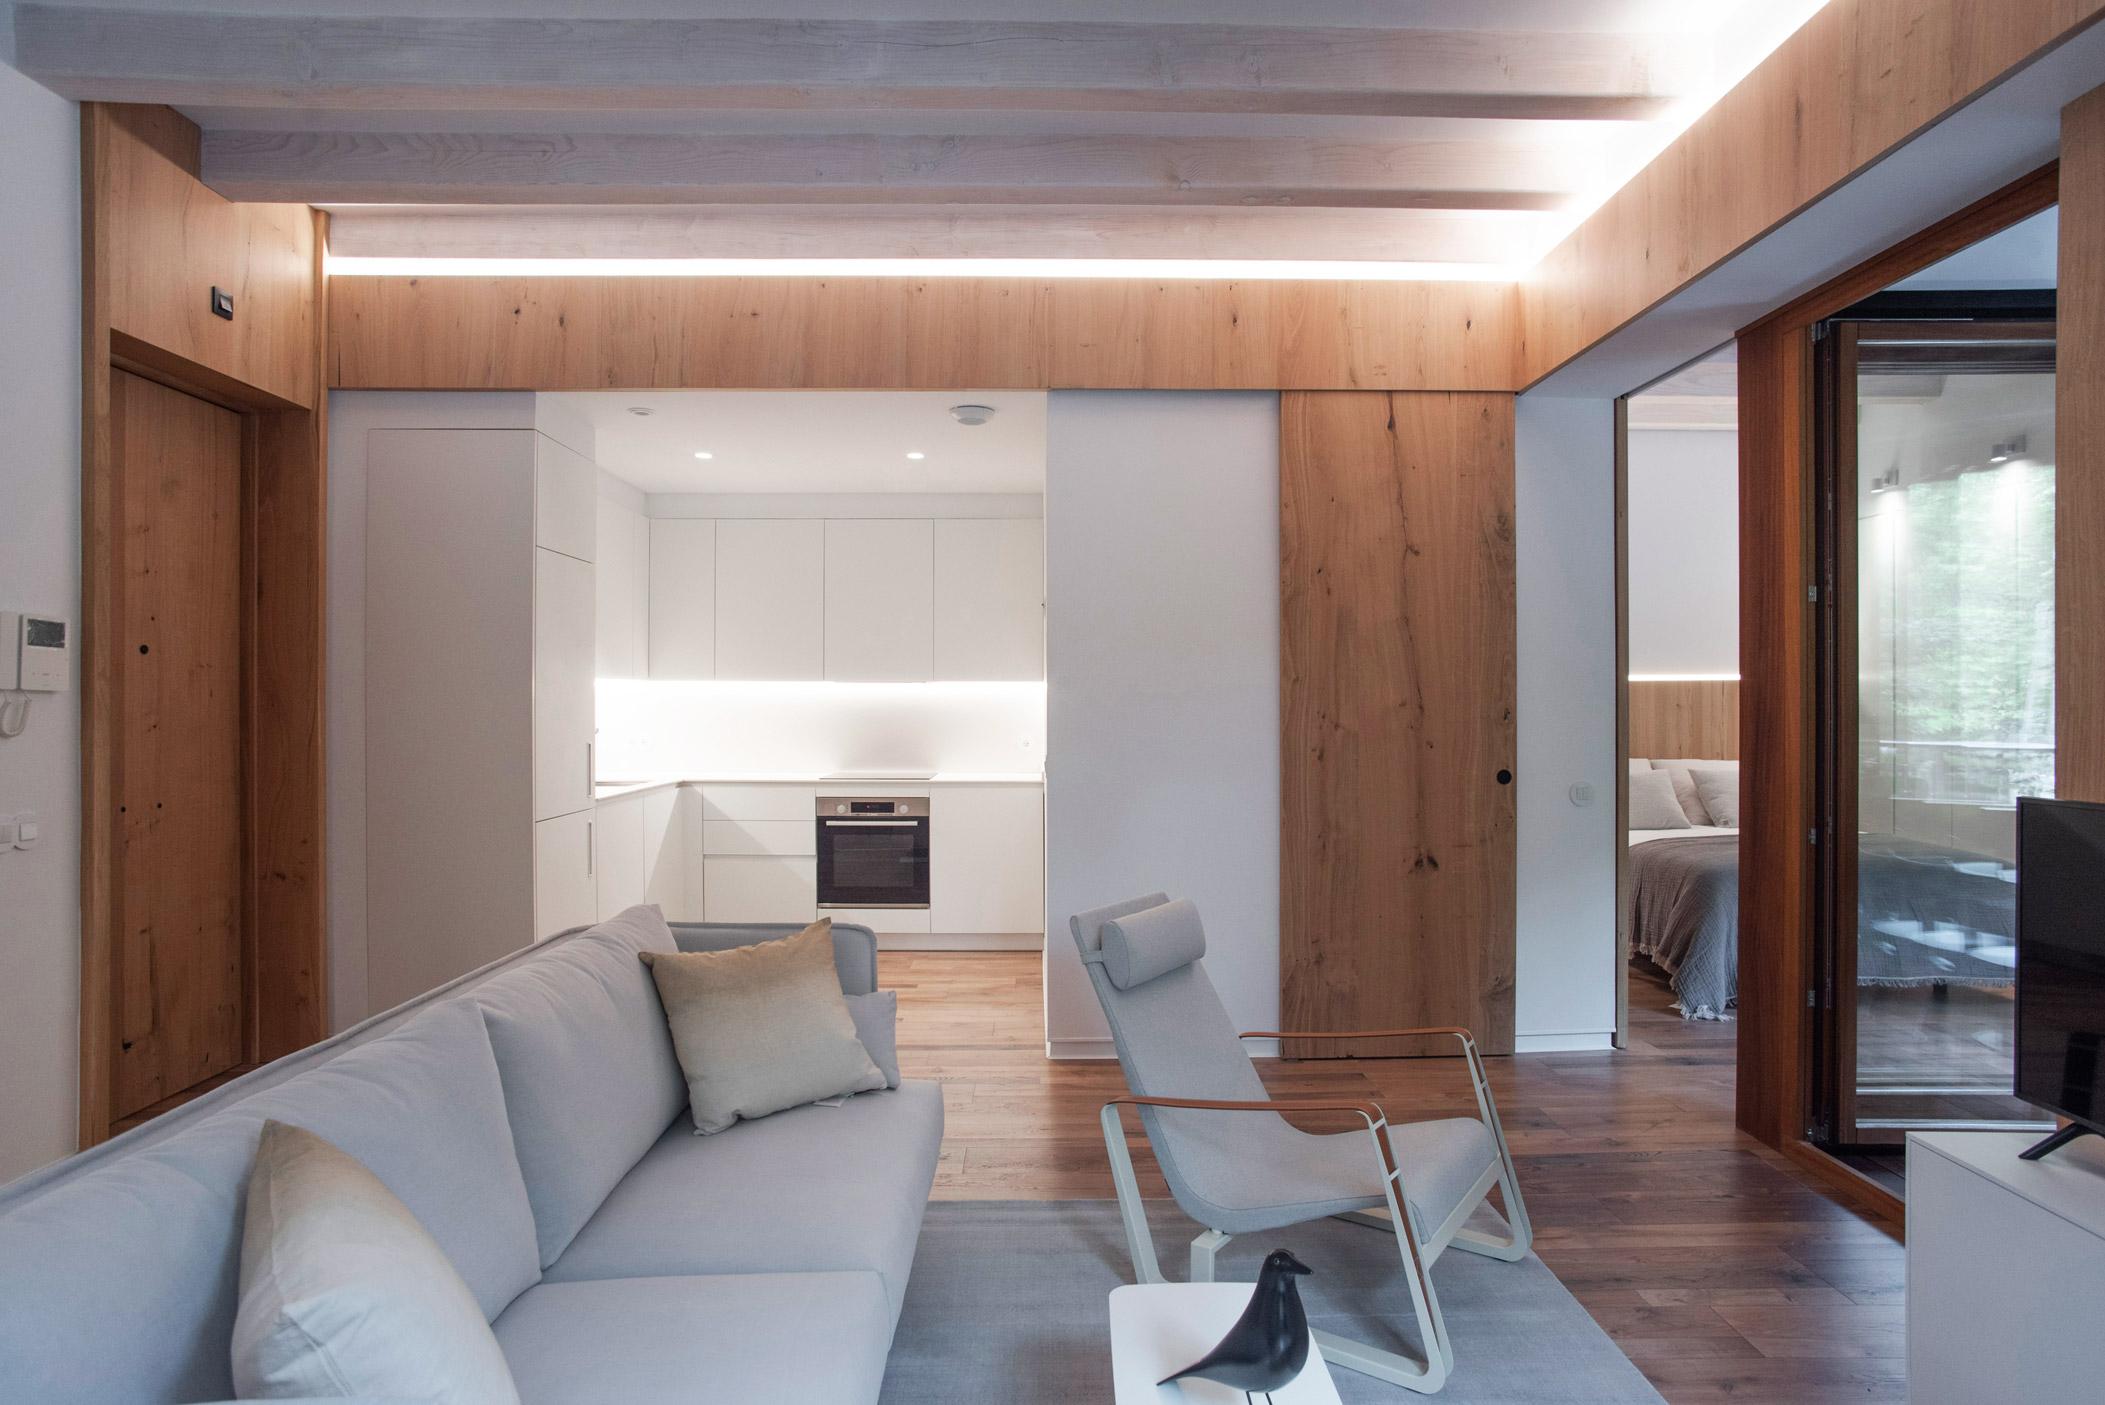 Proyecto paymobiliario palacete